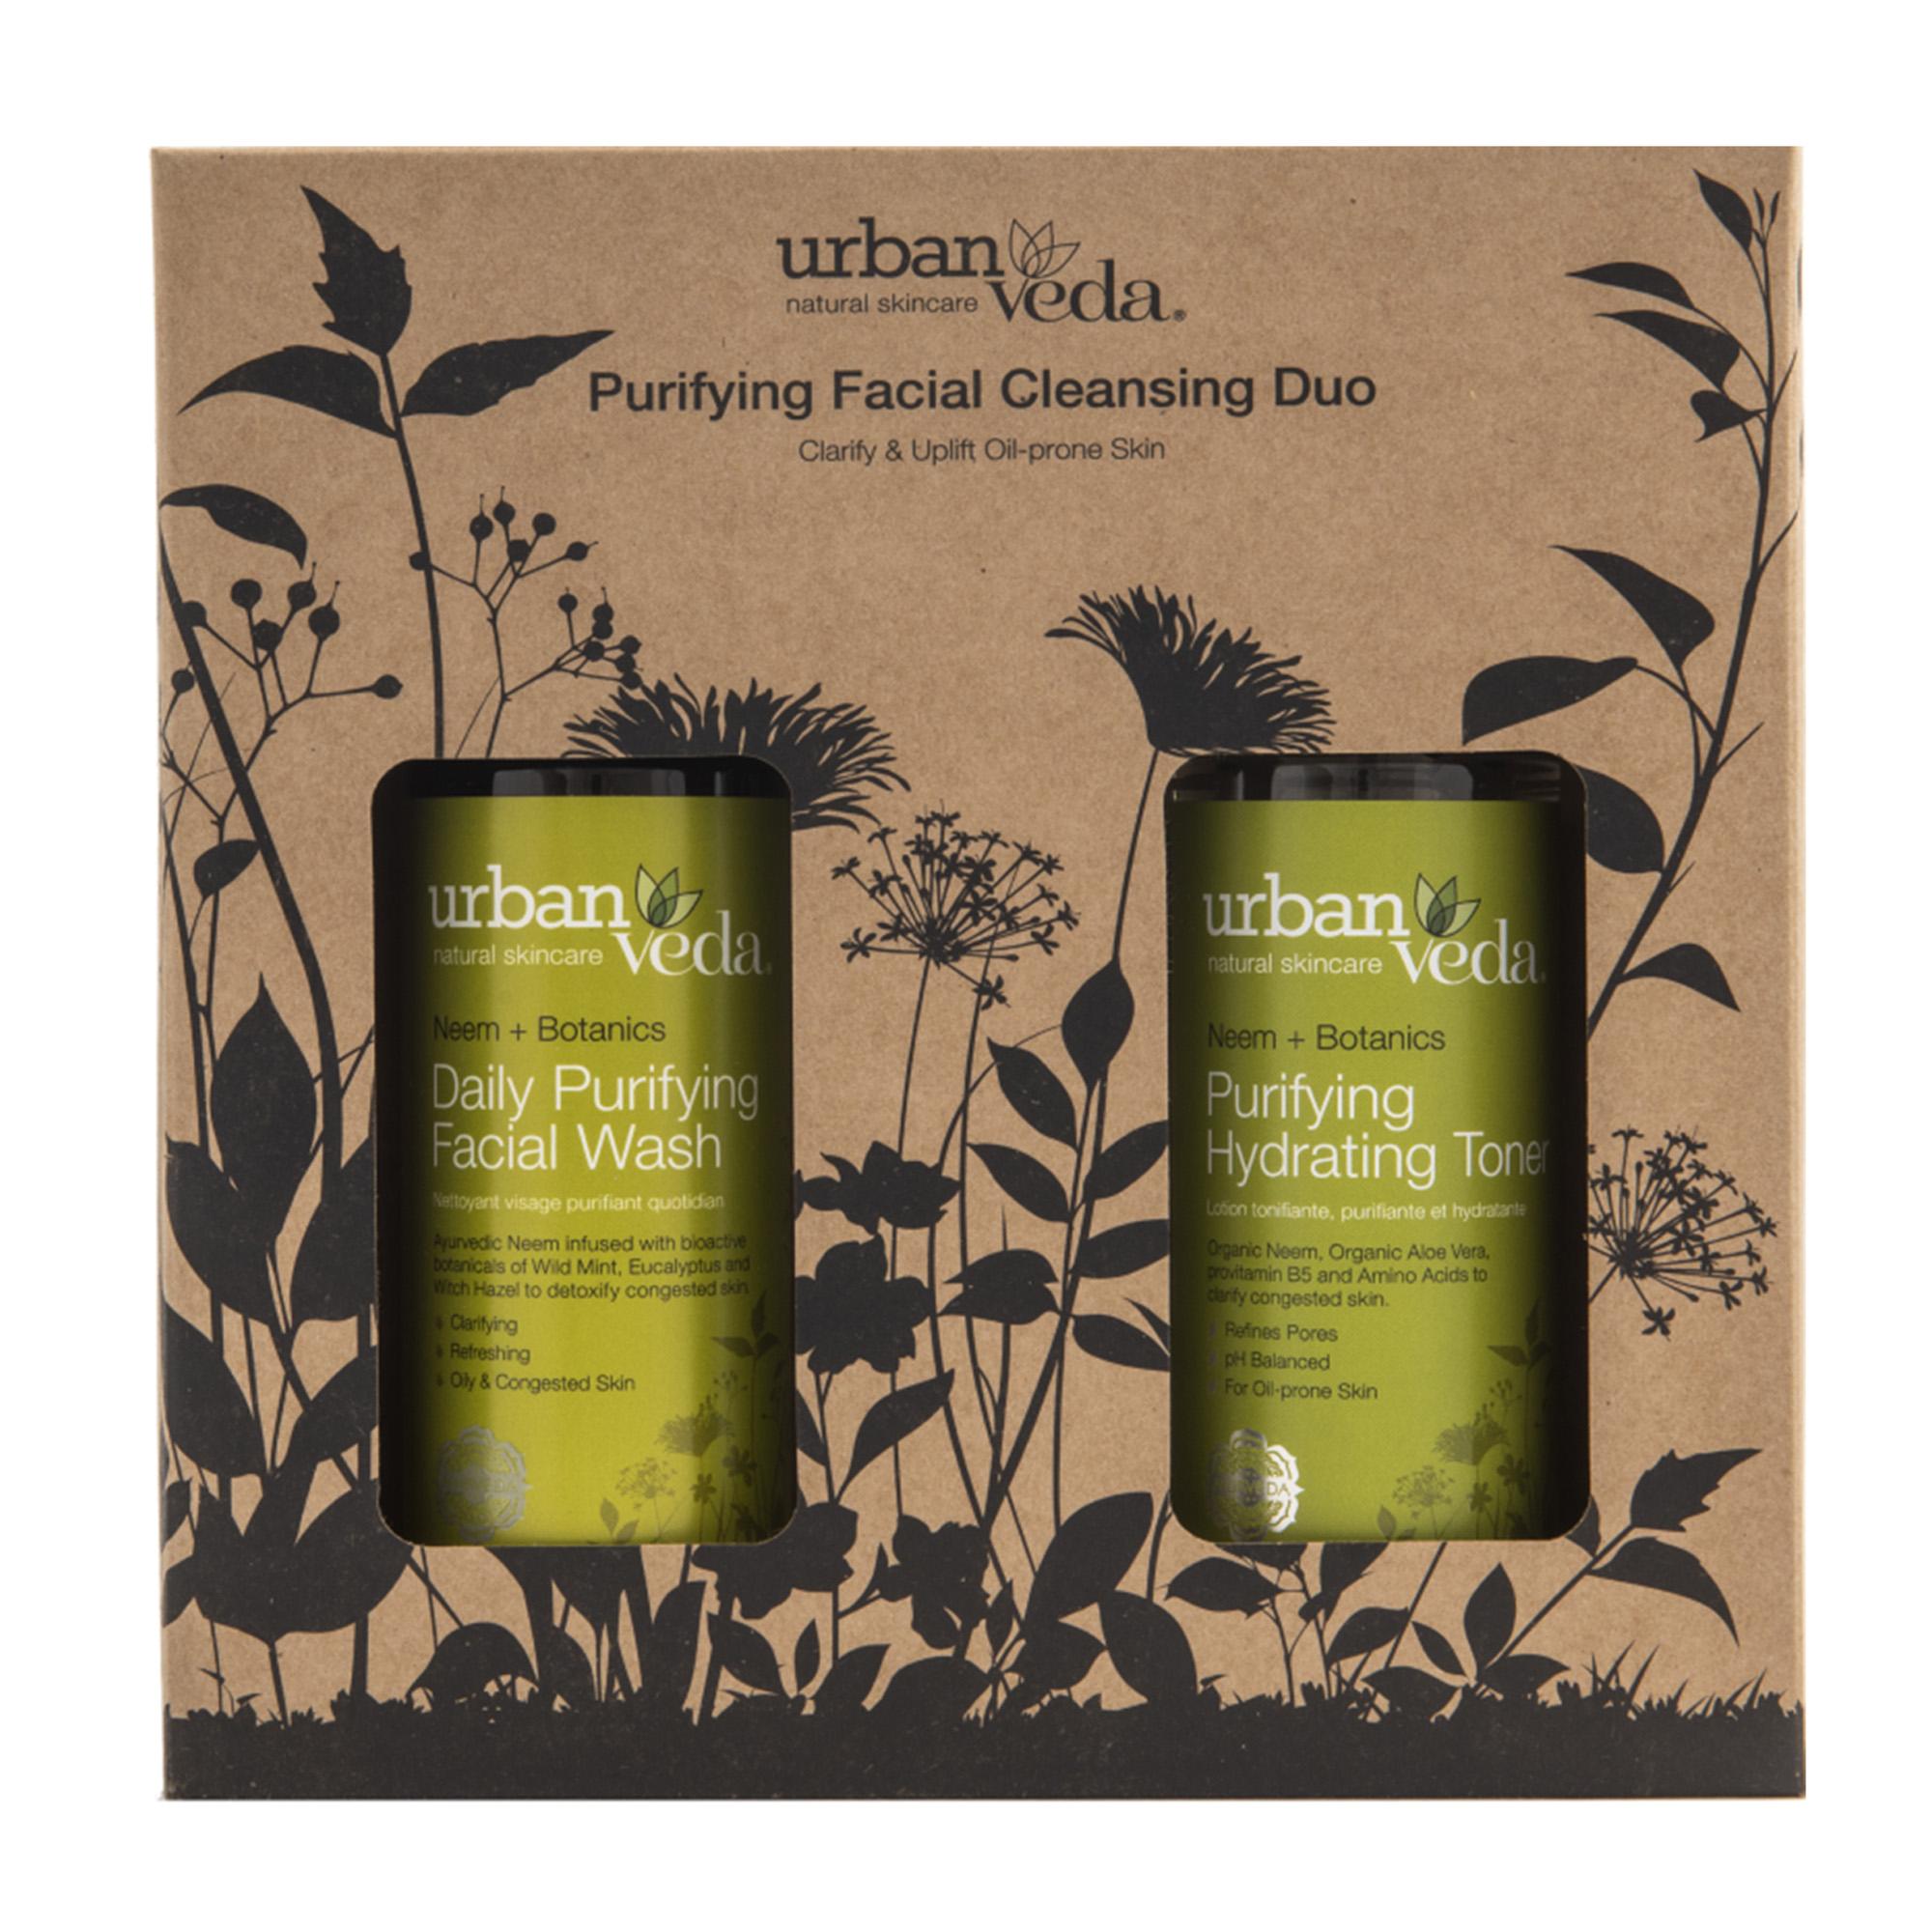 Urban Veda | Urban Veda Purifying Facial Cleansing Duo